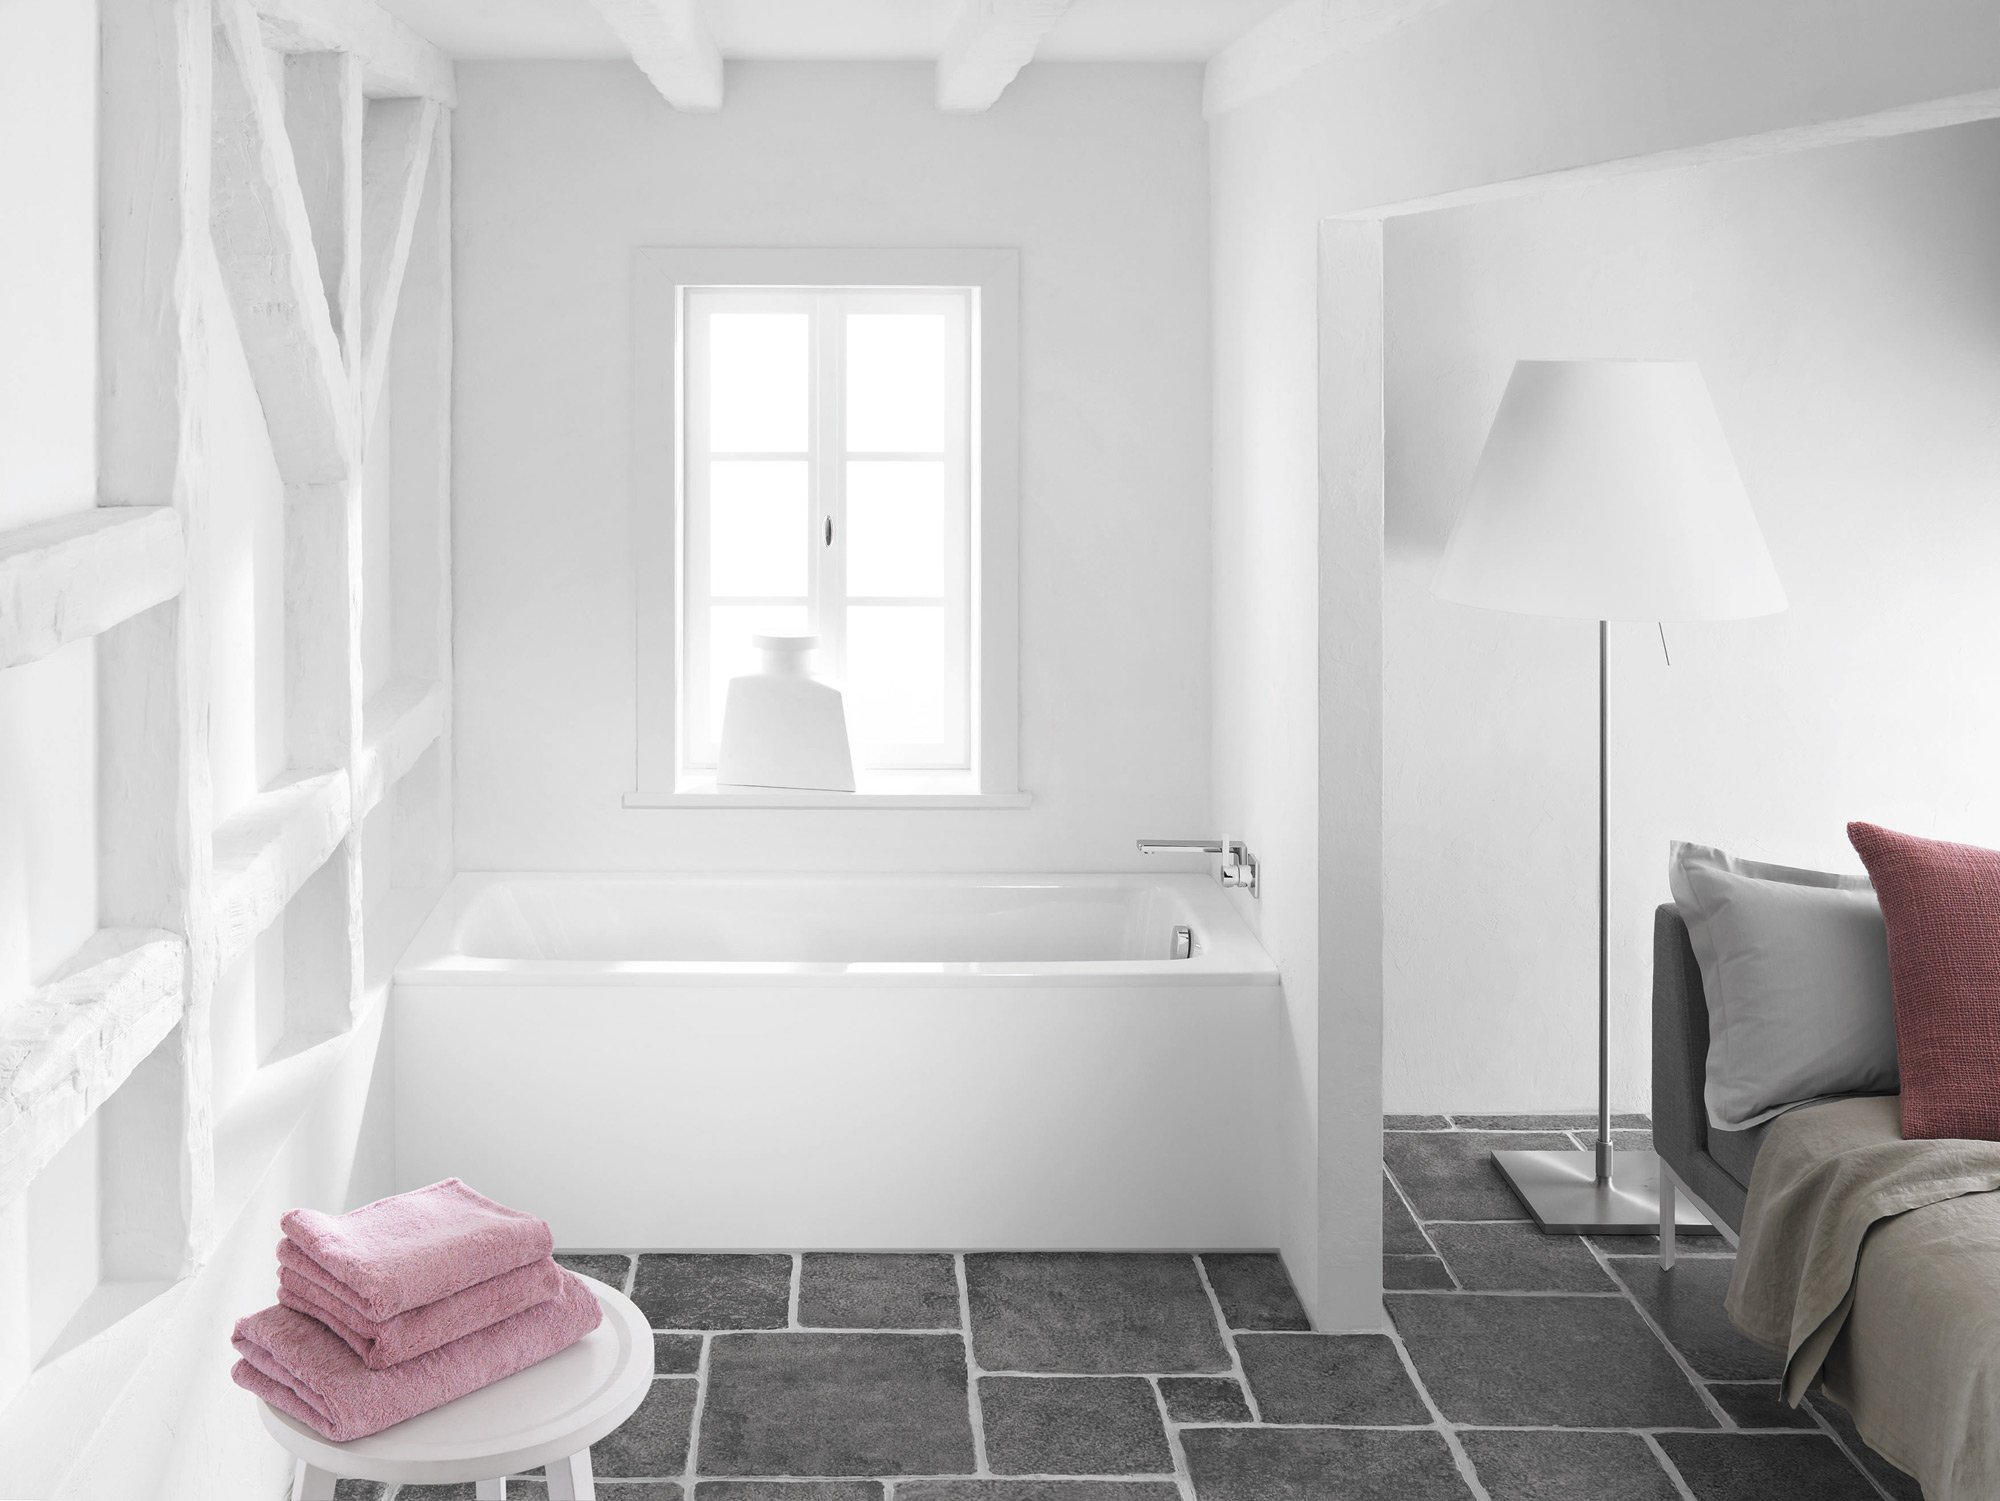 Vasca Da Bagno White : Vasca da bagno con piedi con vasca da bagno con piedini vasche da